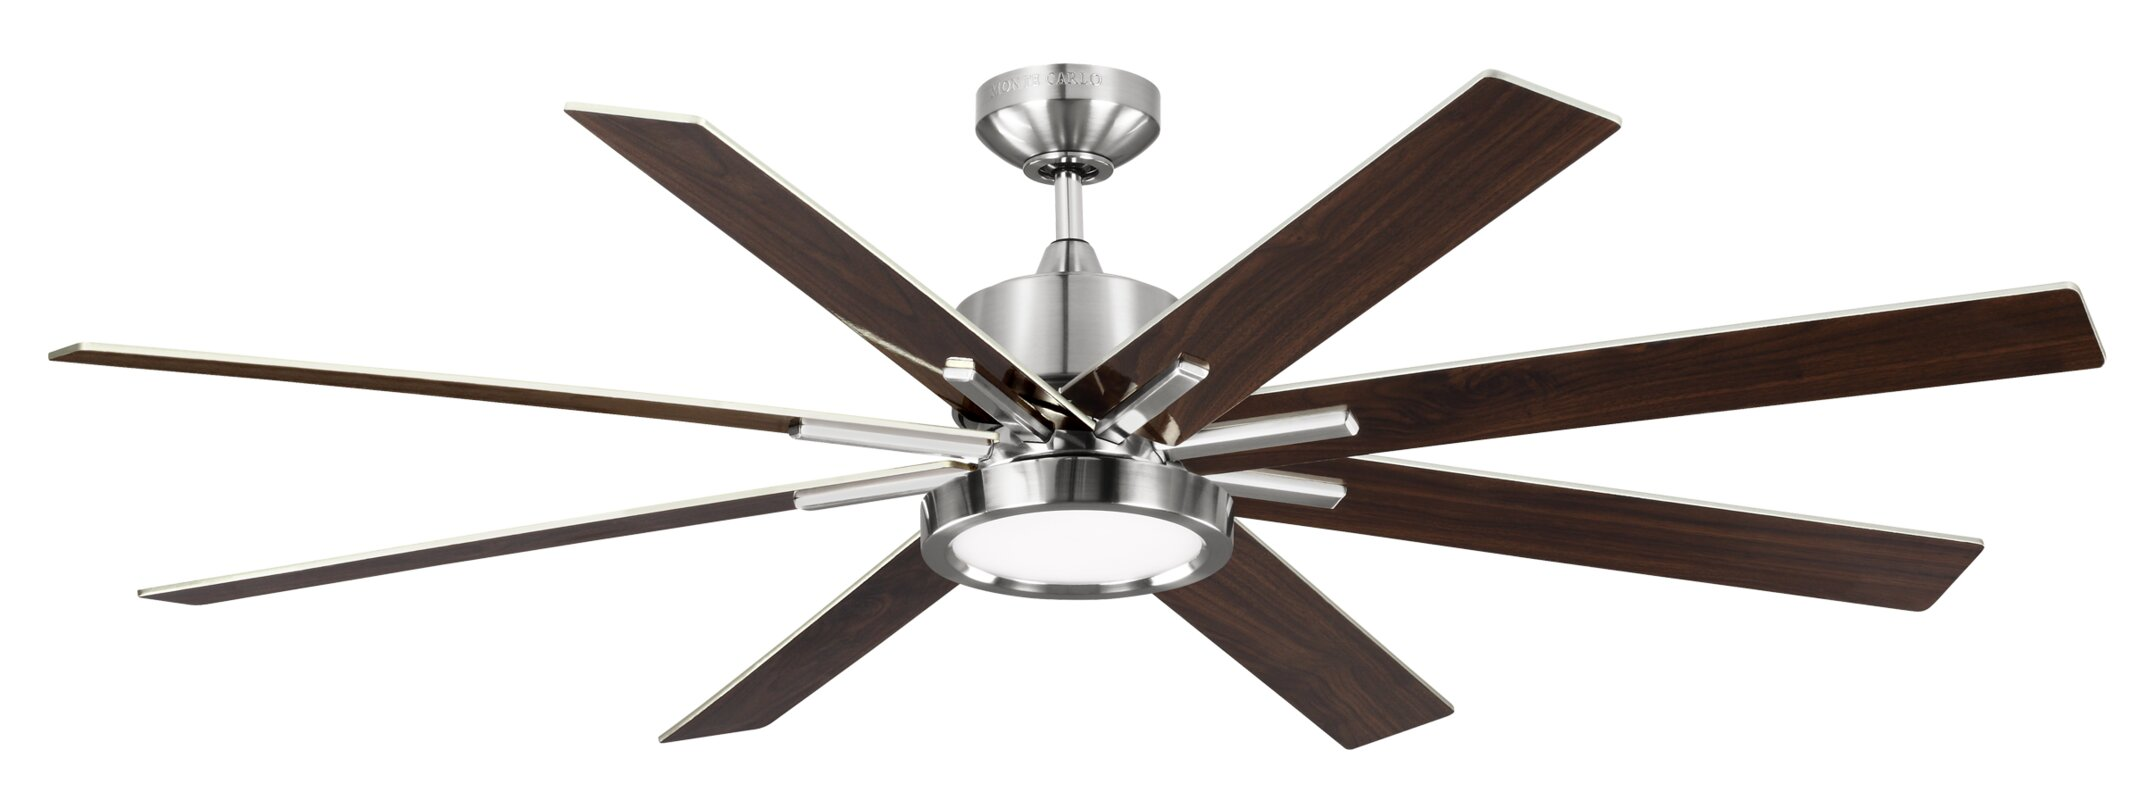 Wade logan 60 woodlynne 8 blade outdoor ceiling fan with remote 60 woodlynne 8 blade outdoor ceiling fan with remote audiocablefo